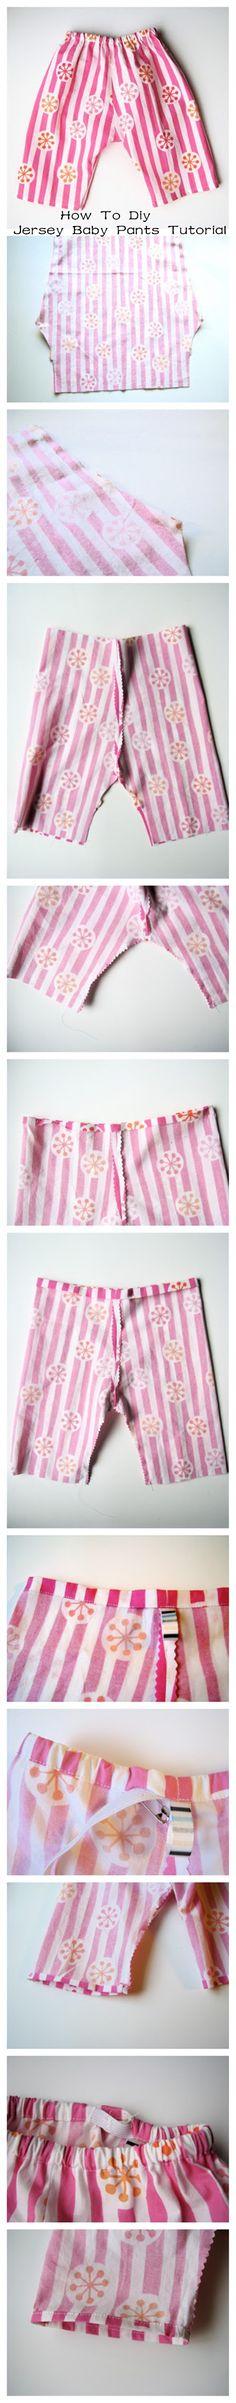 How To #Diy Jersey #Baby Pants #Tutorial